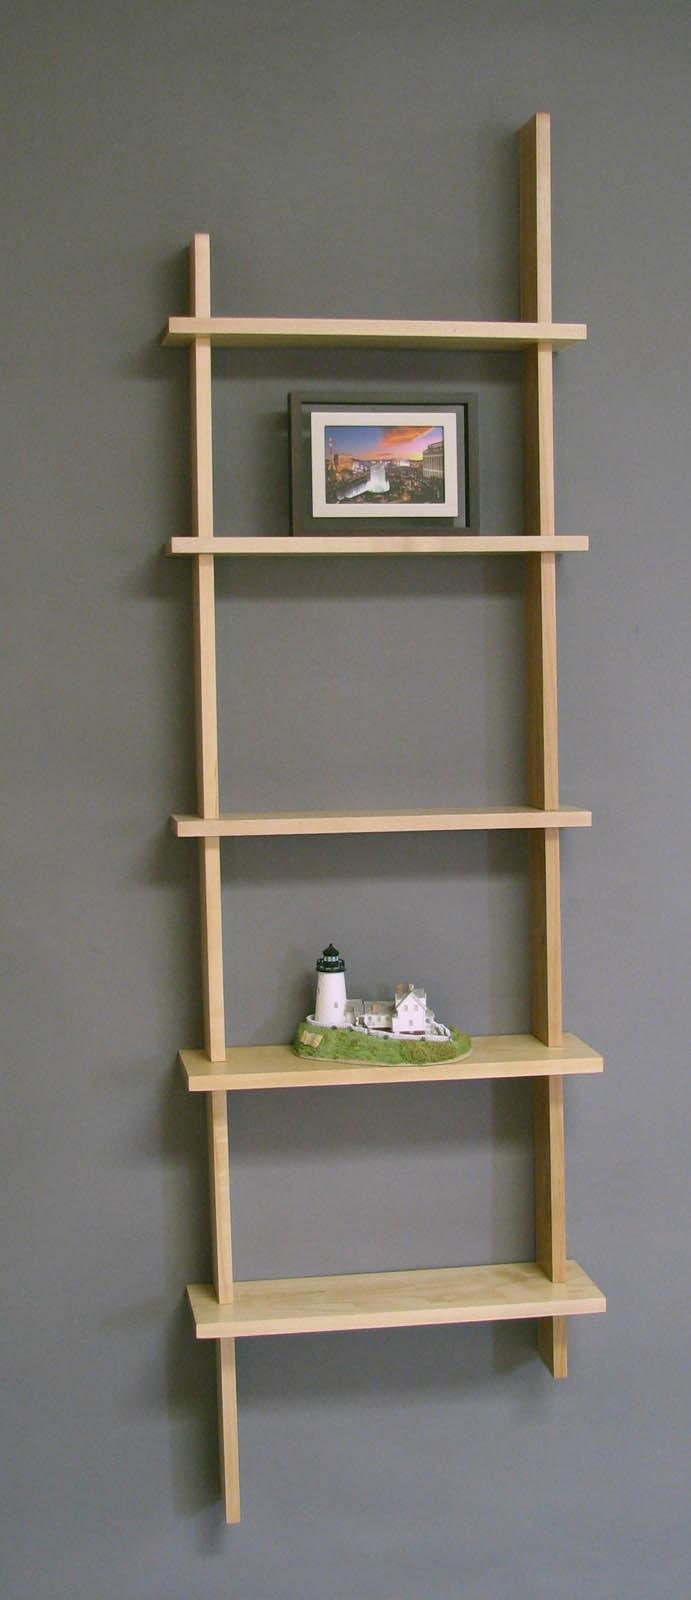 Deluxe Vertical Five Shelf Wall Unit By Woodform In Wall